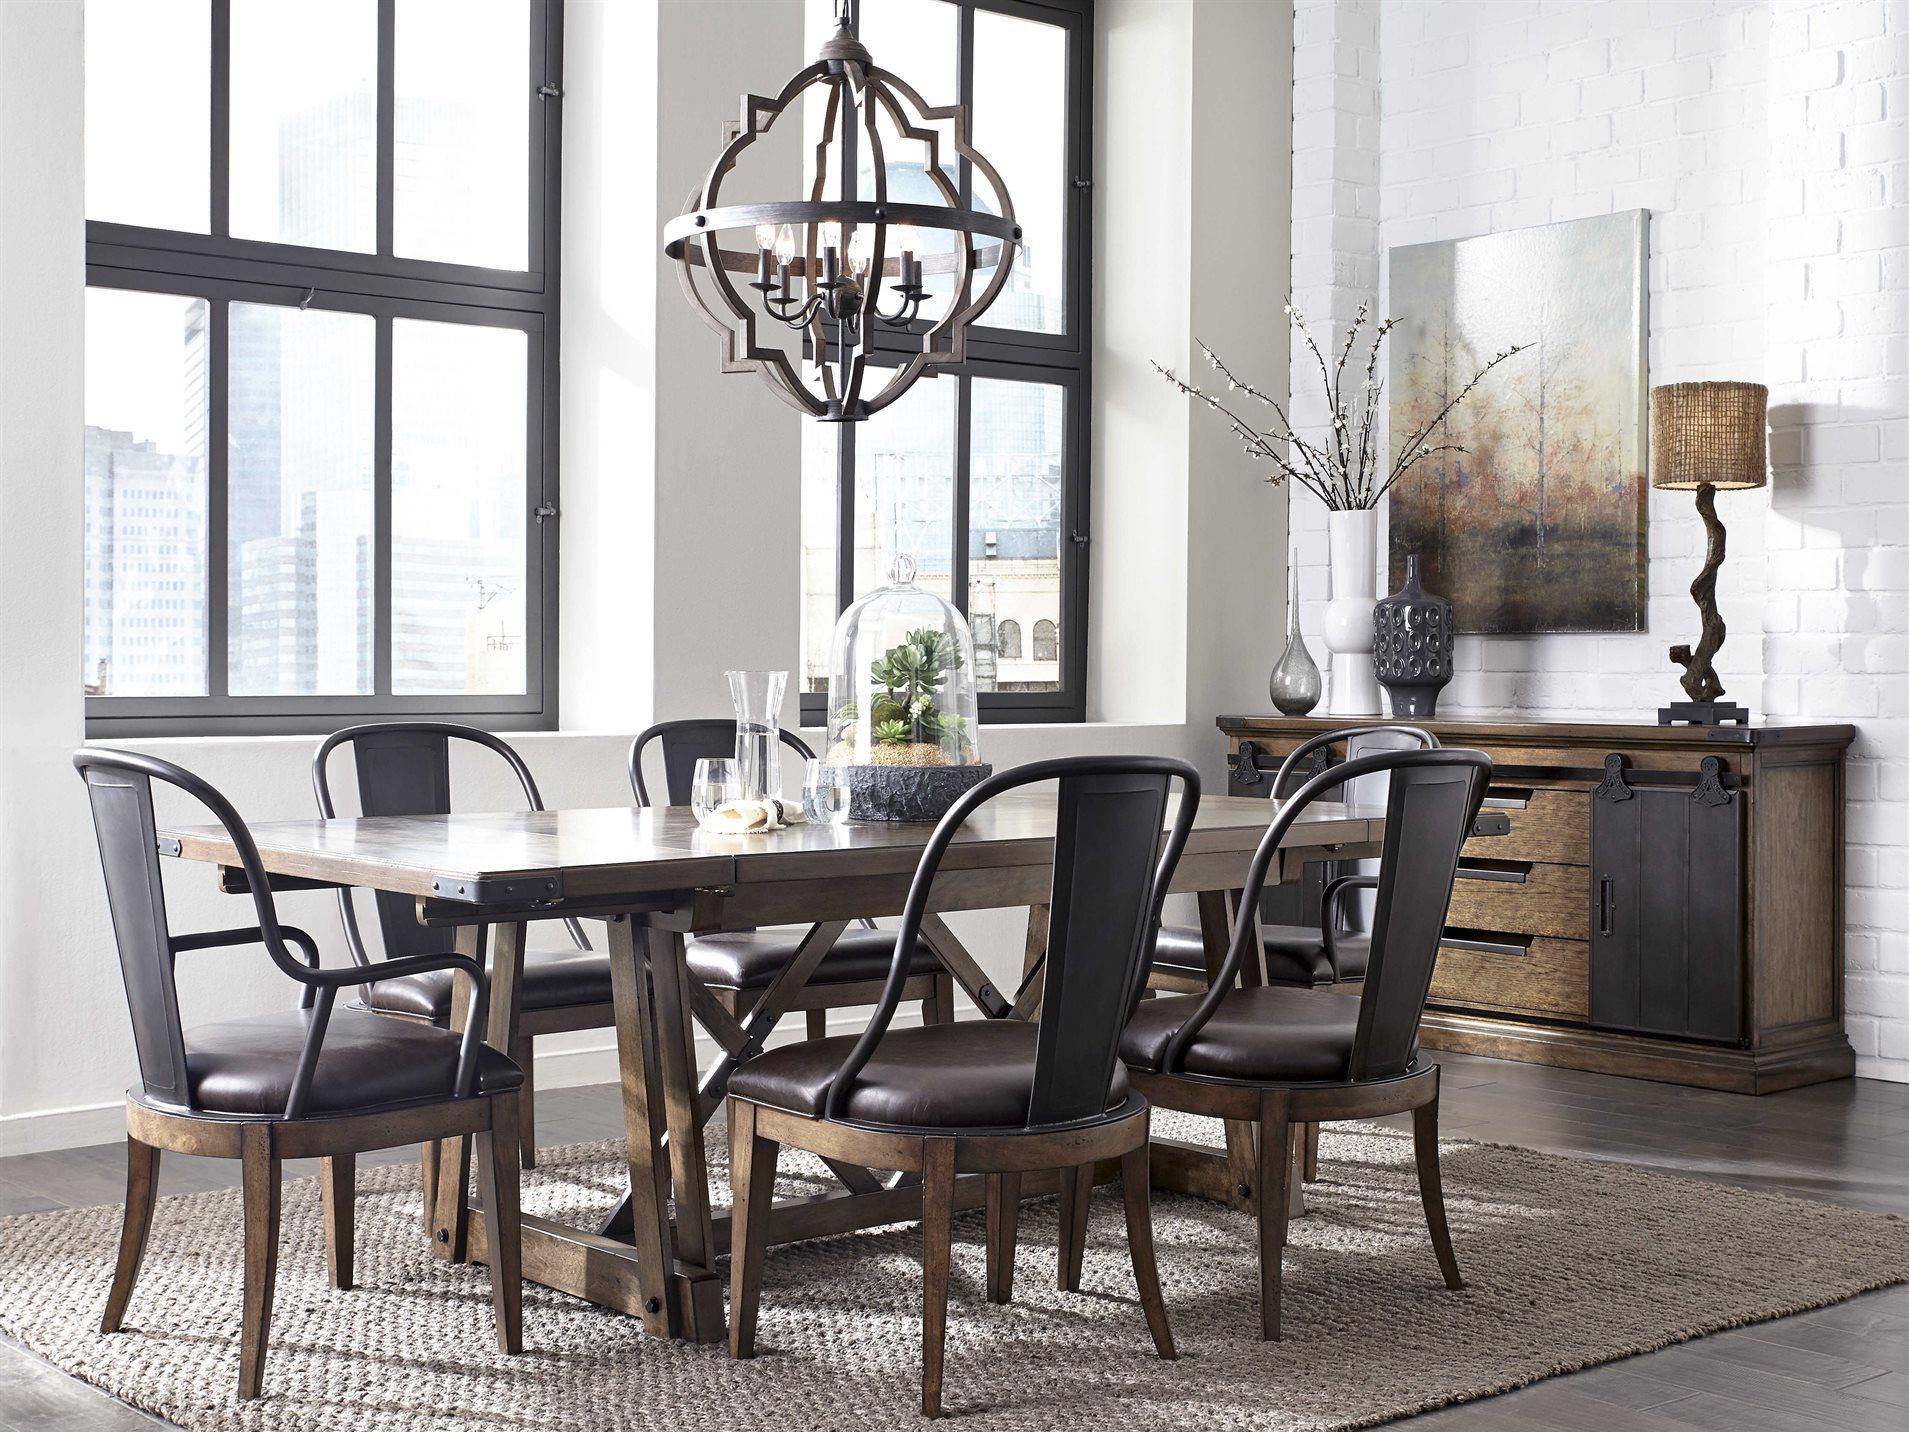 Pulaski Weston Loft Rectangular Table Dining Room Set ...